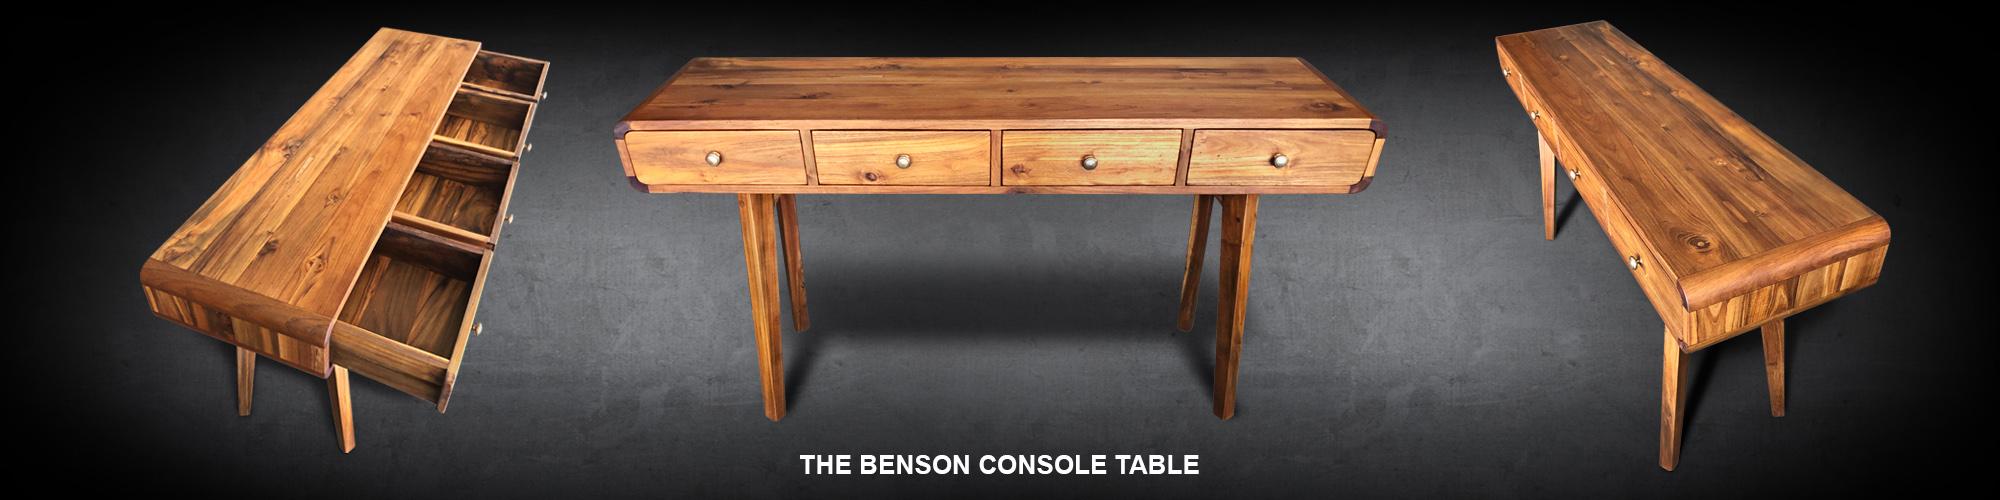 Mid-Century Modern Benson console handcrafted reclaimed teak wood